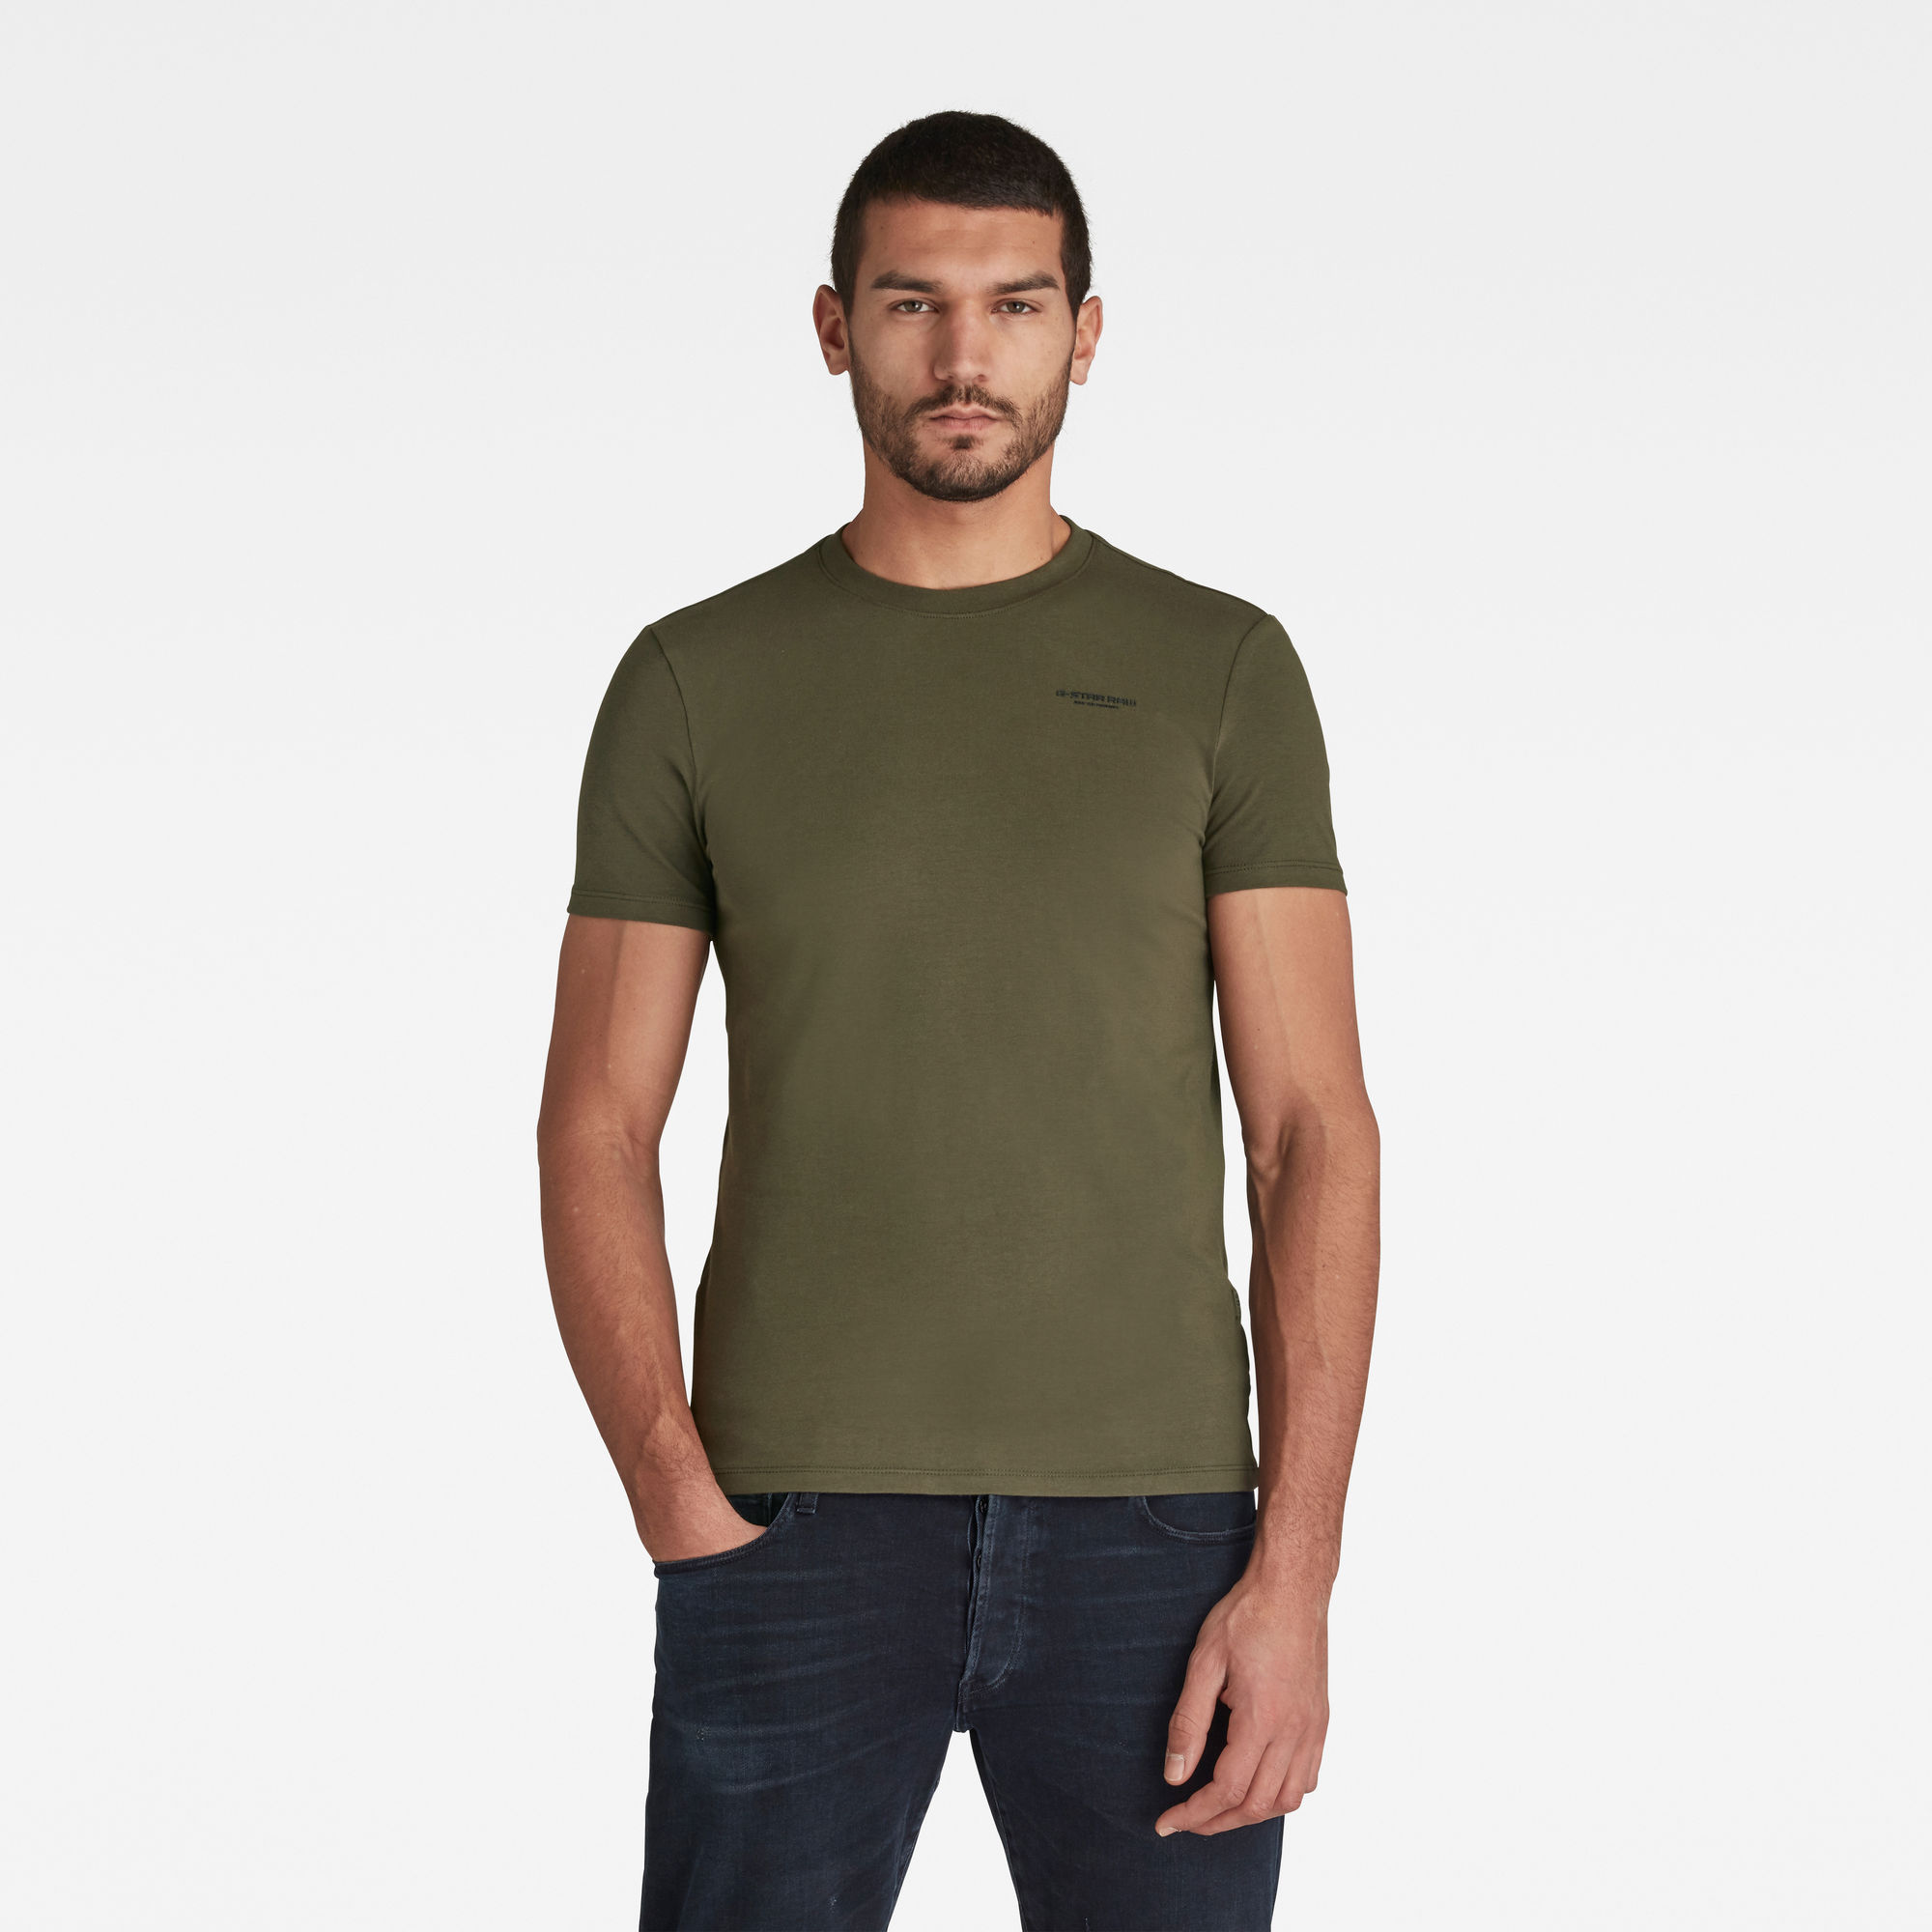 G-Star RAW Heren Slim Base T-Shirt Groen